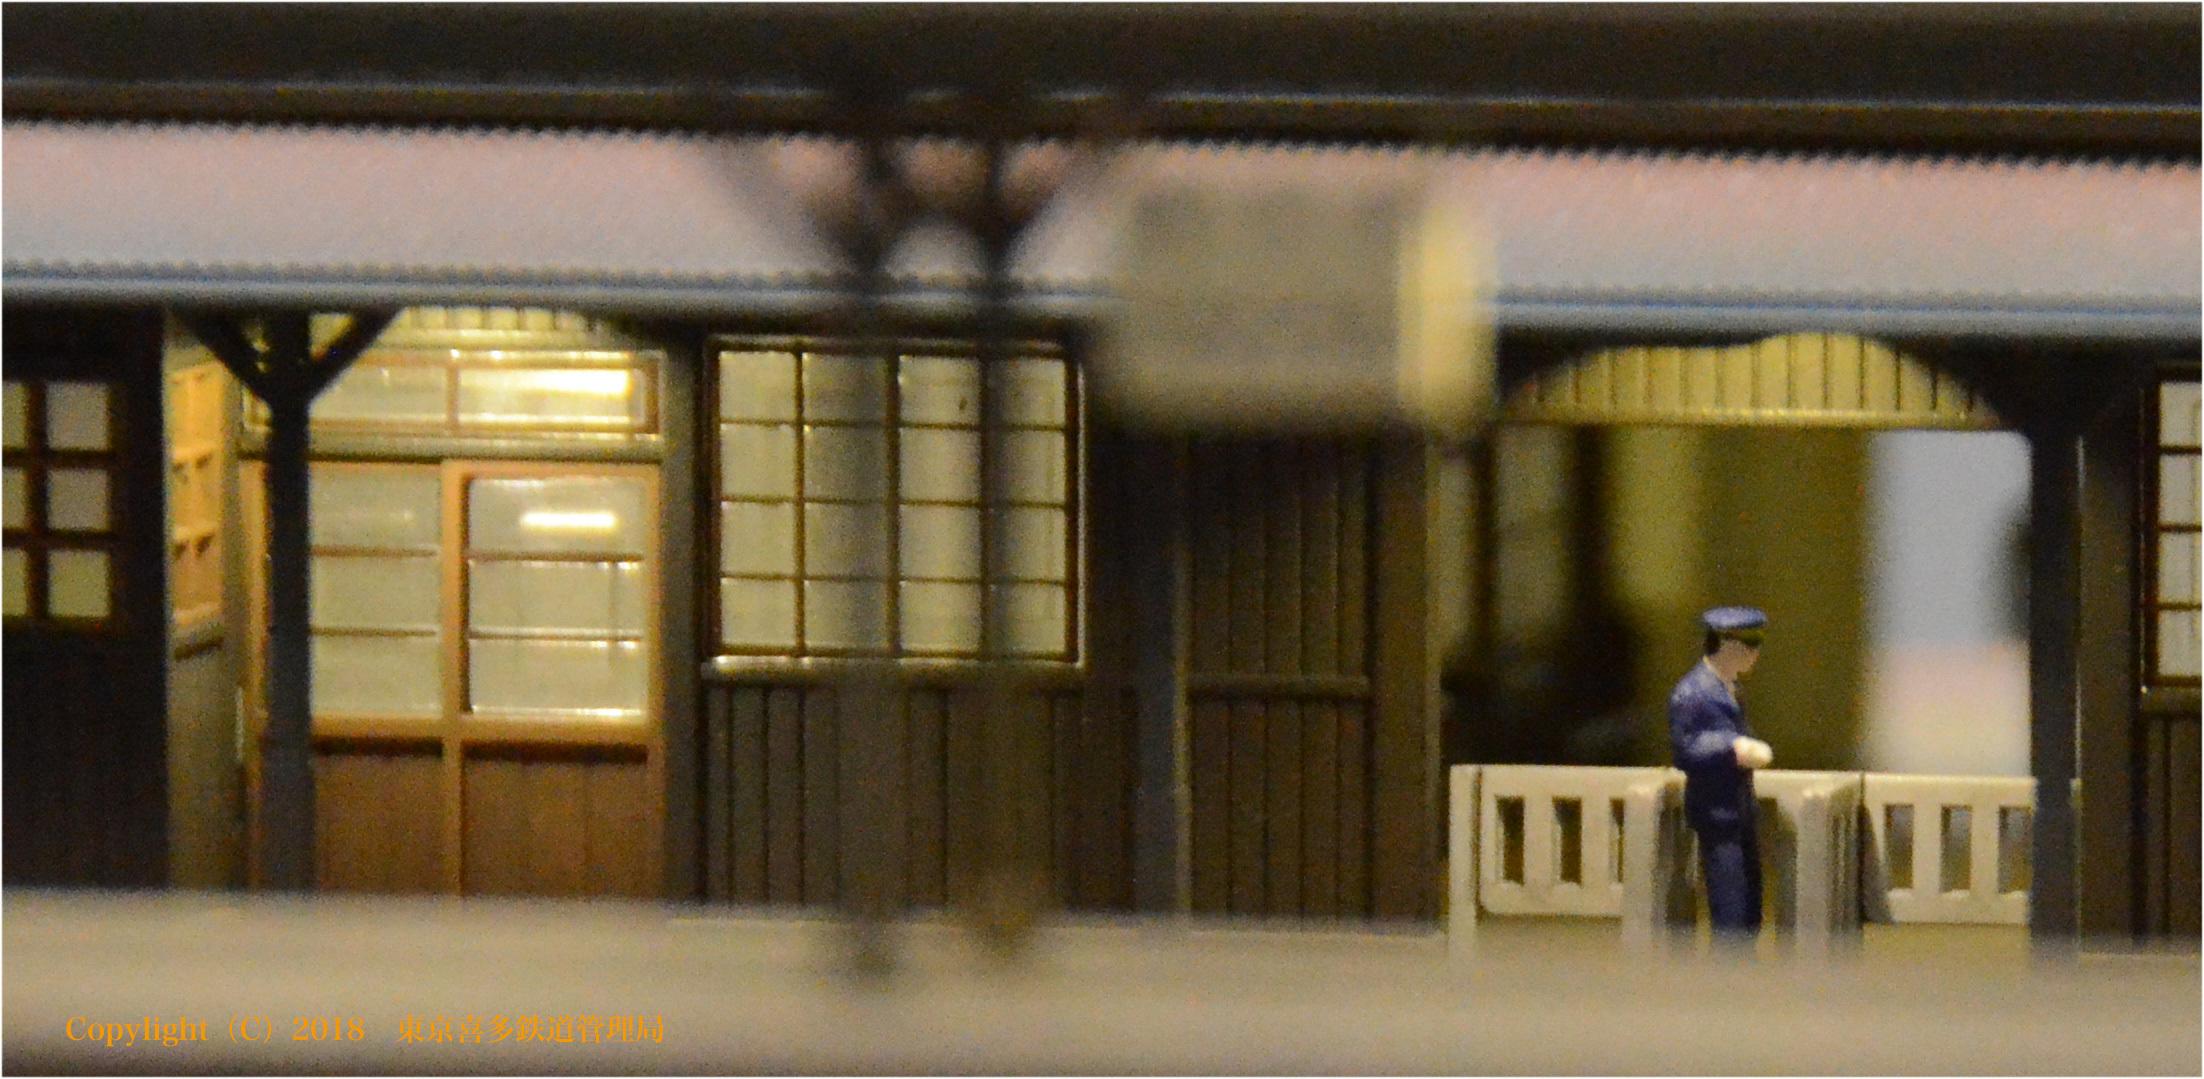 180804_013_kun.jpg